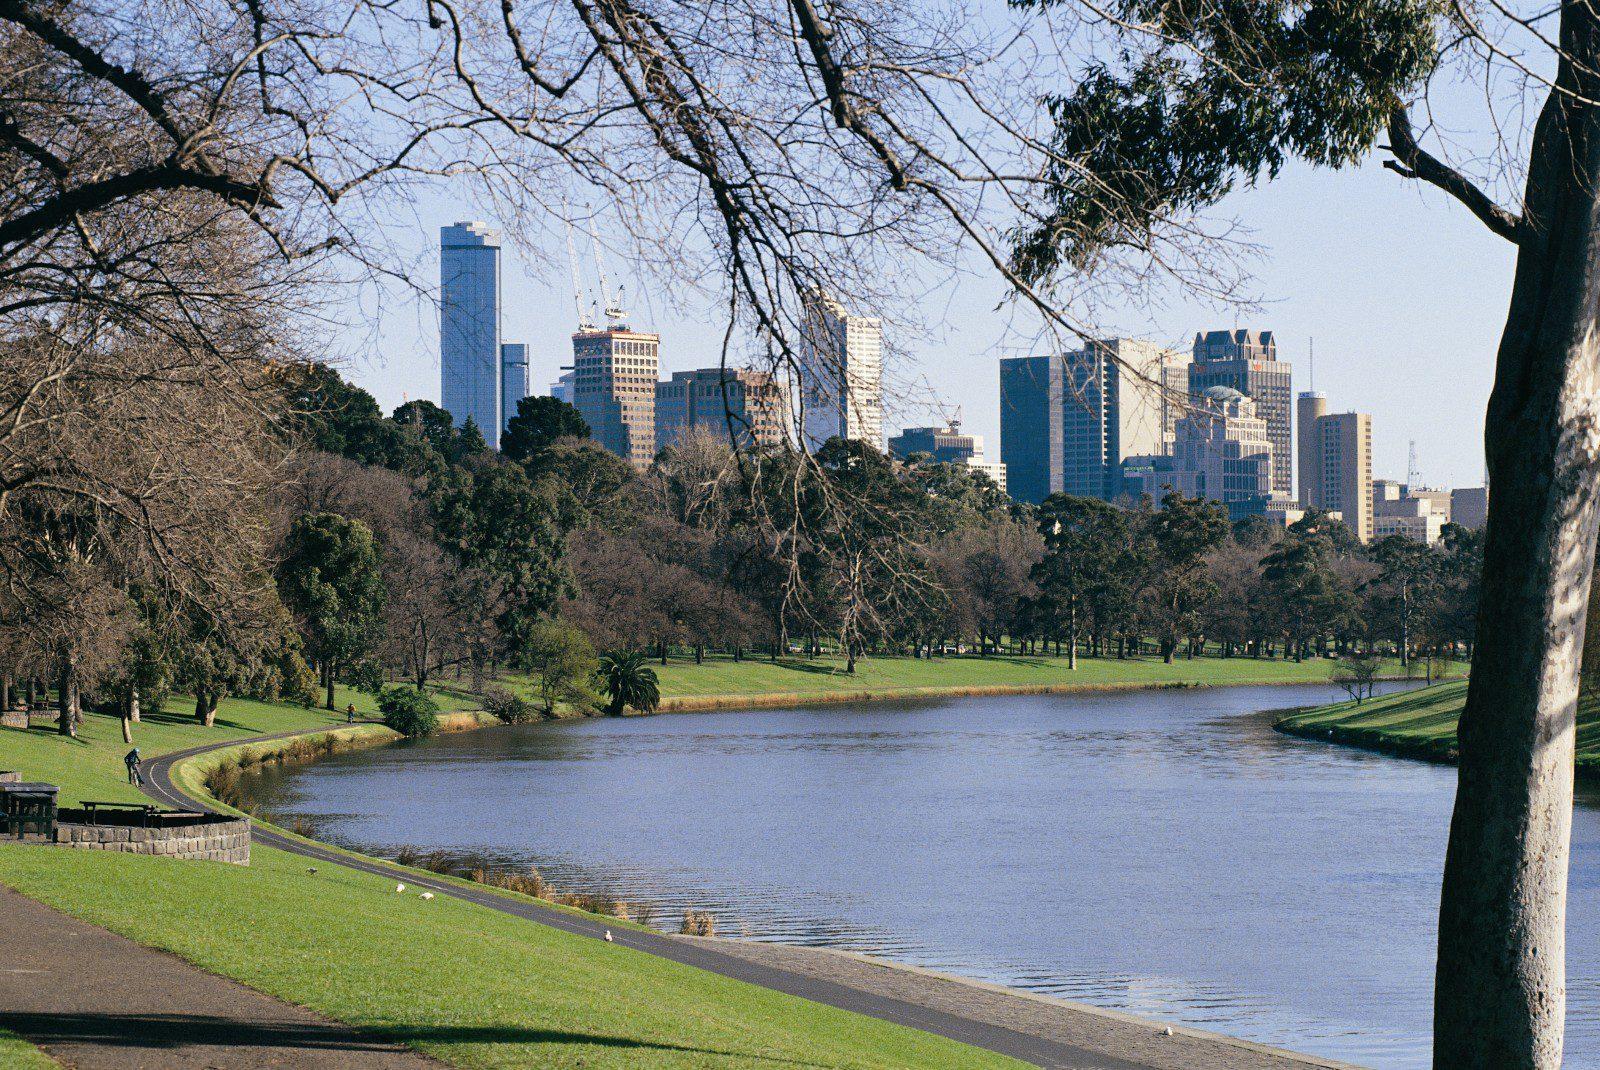 Baghdad Hd Wallpapers Park Regis Southbank Melbourne Victoria